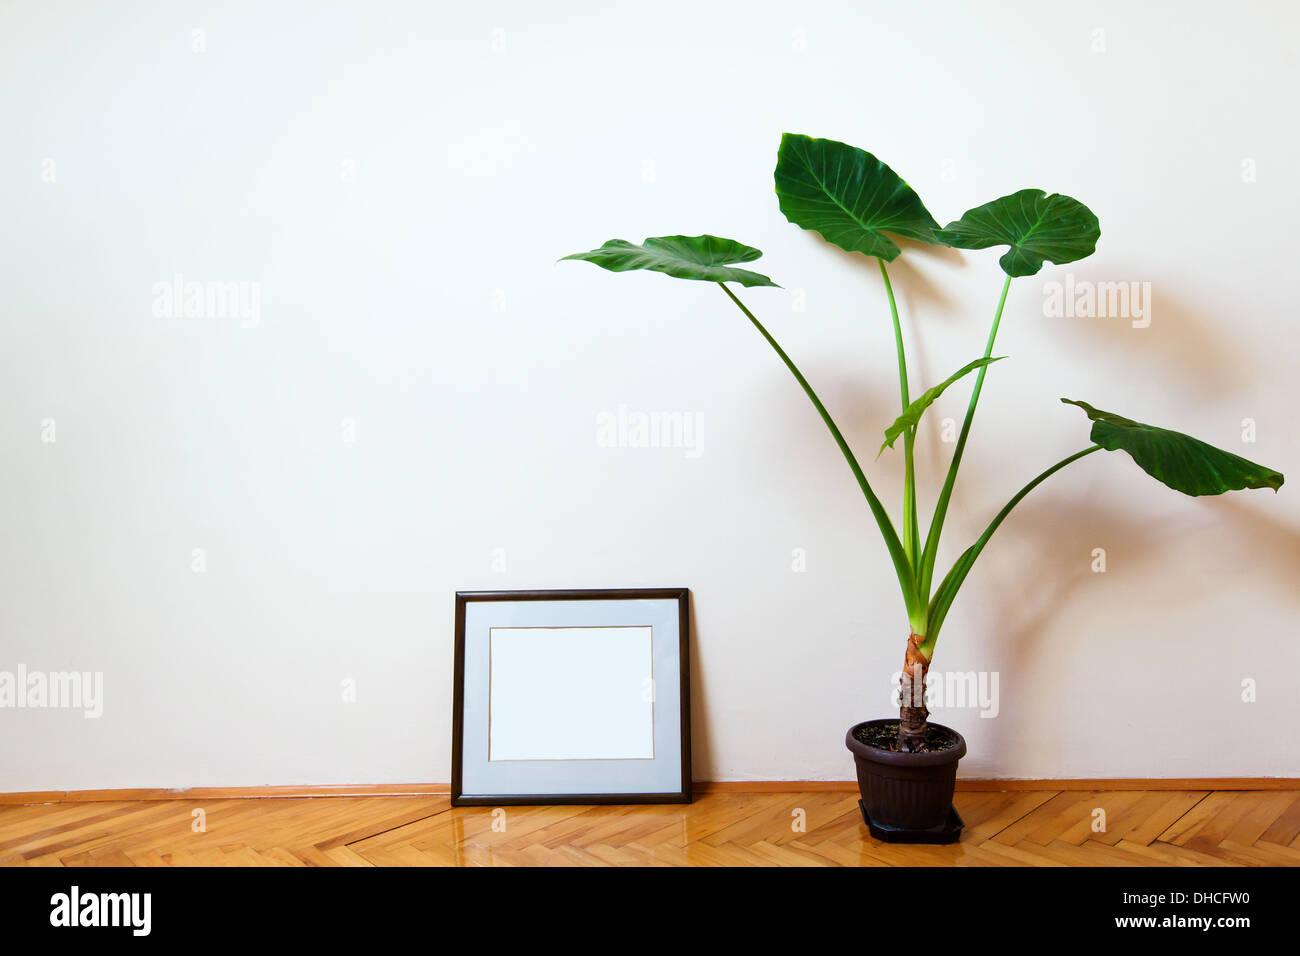 room - Stock Image